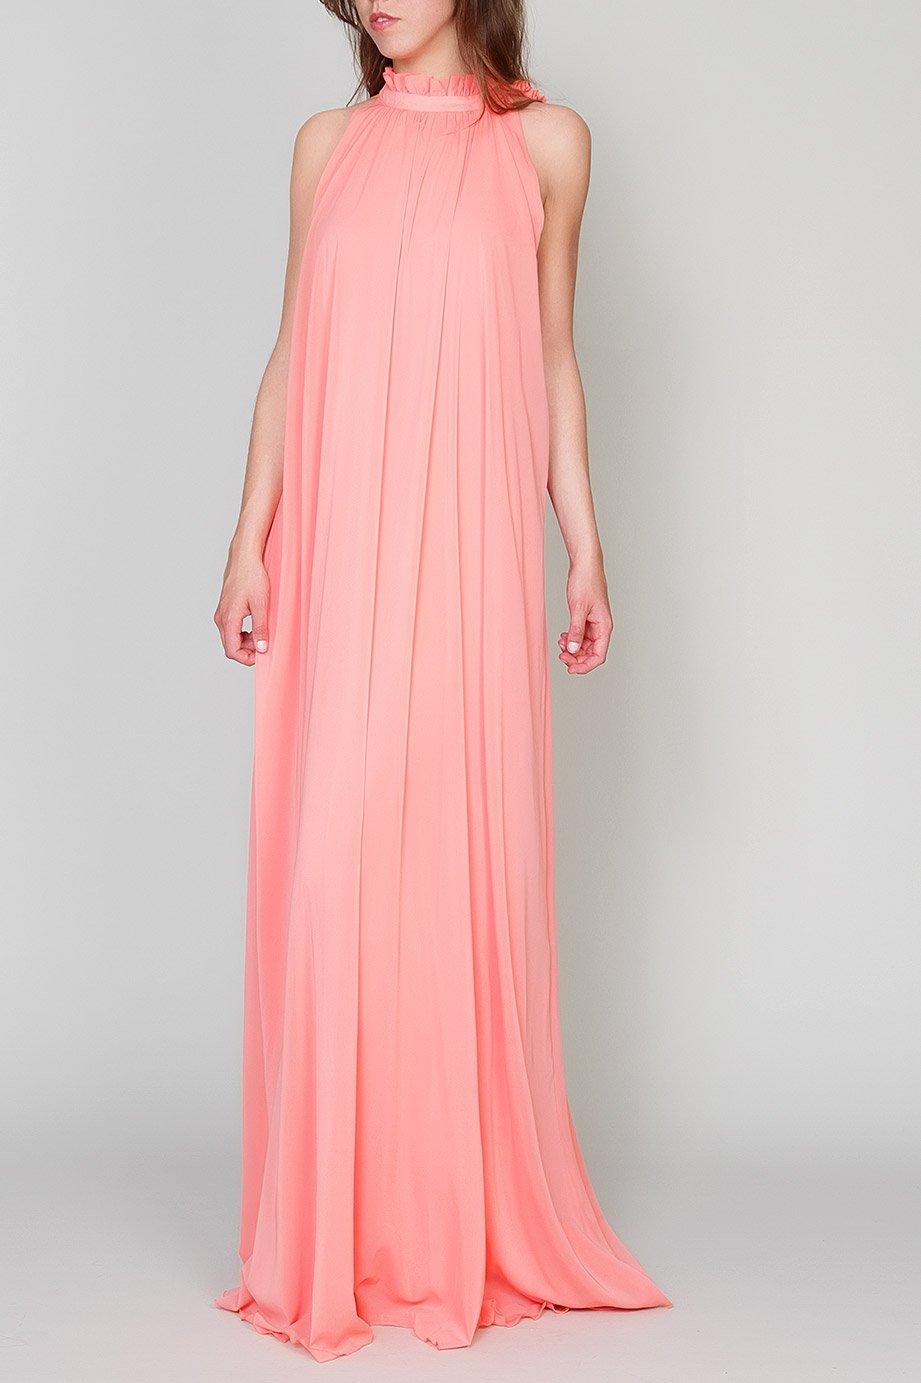 Estupendos vestidos largos muy sueltos para fiestas | AquiModa.com